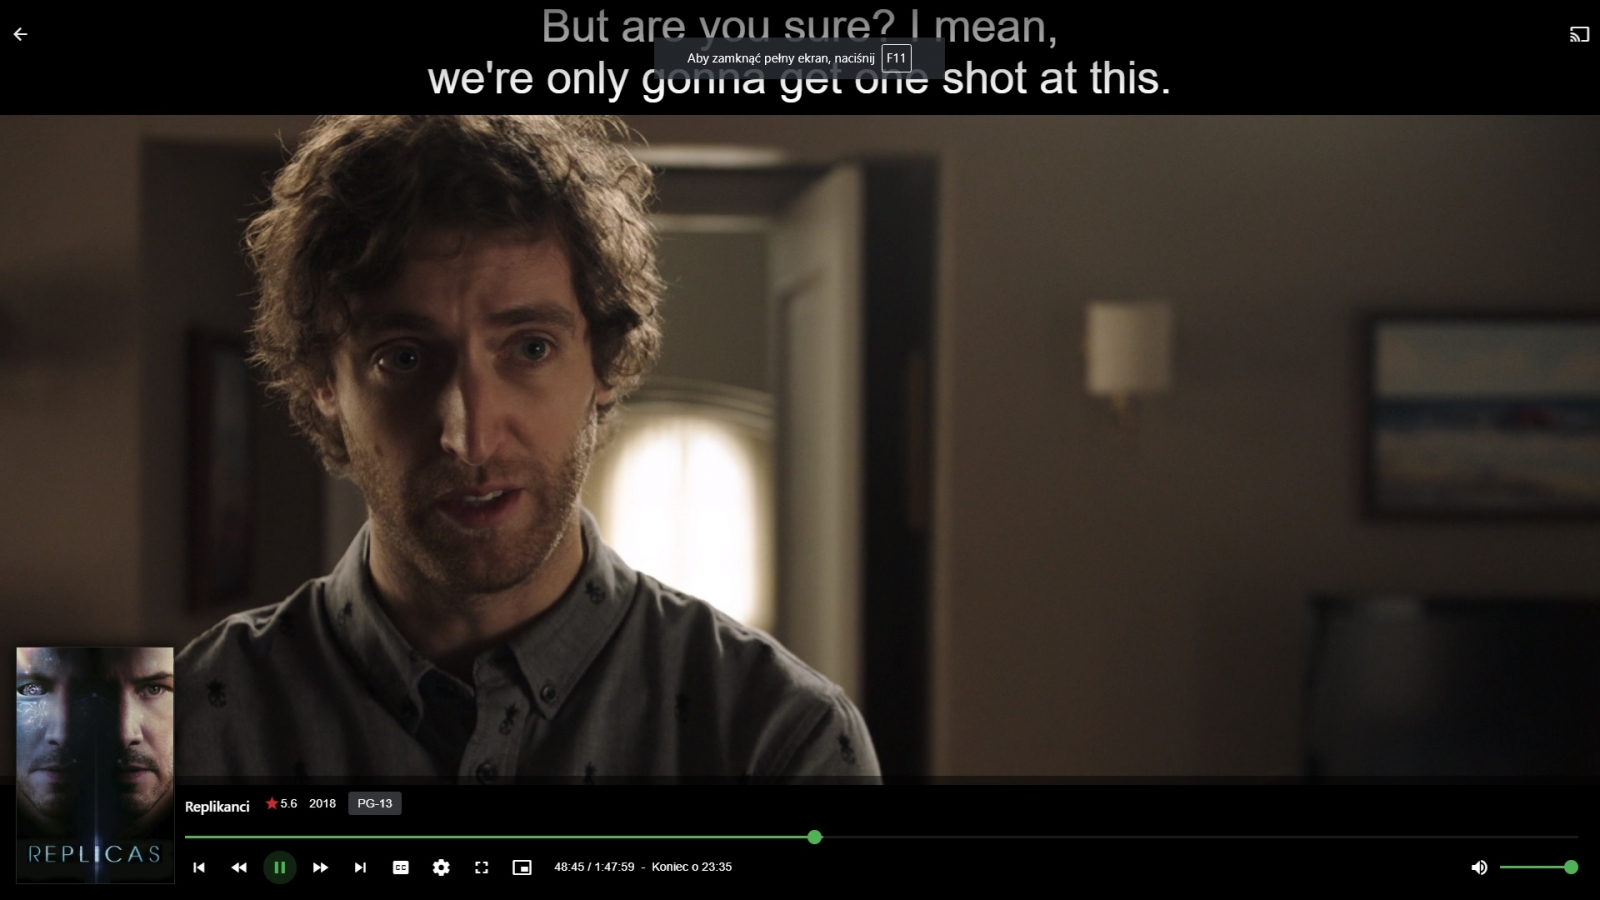 5ccca729bd22a_subtitles.jpg